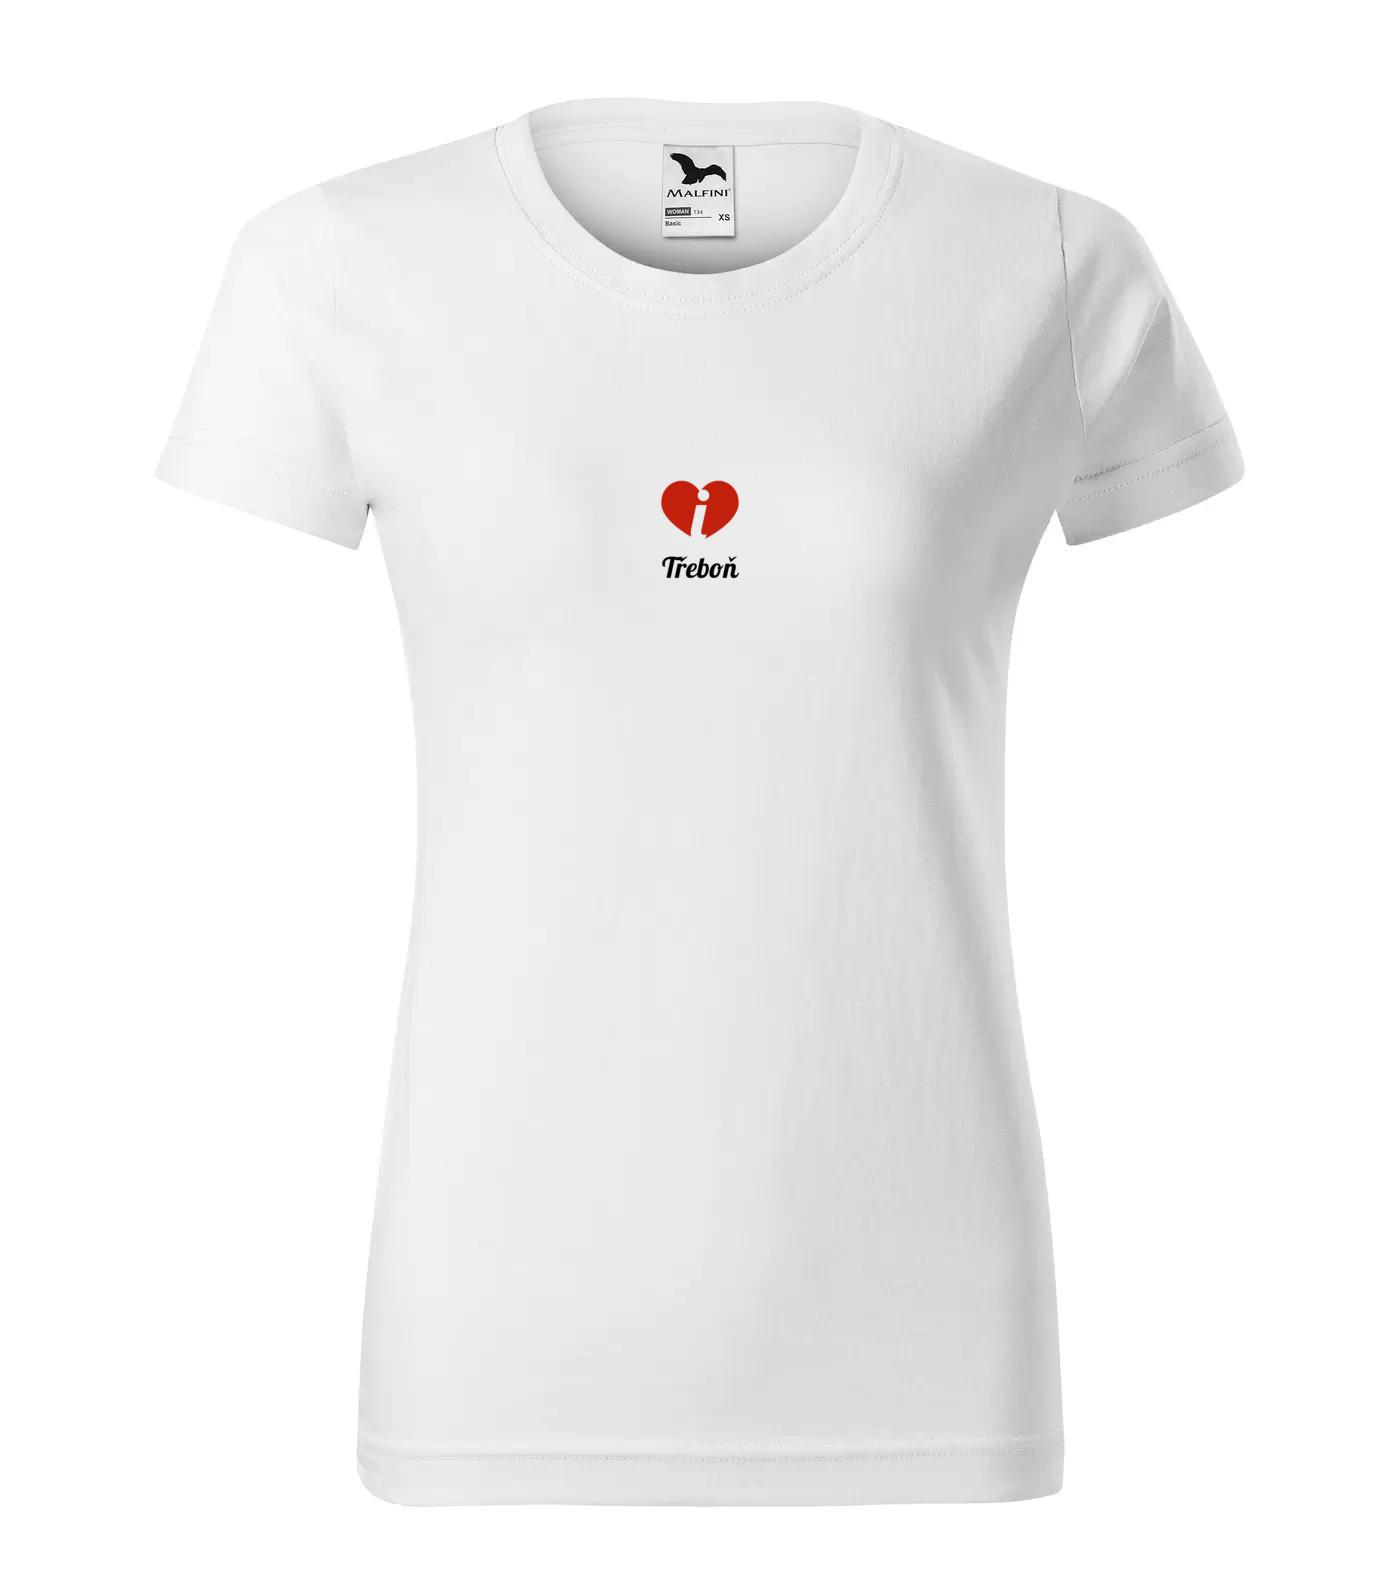 Tričko Třeboň